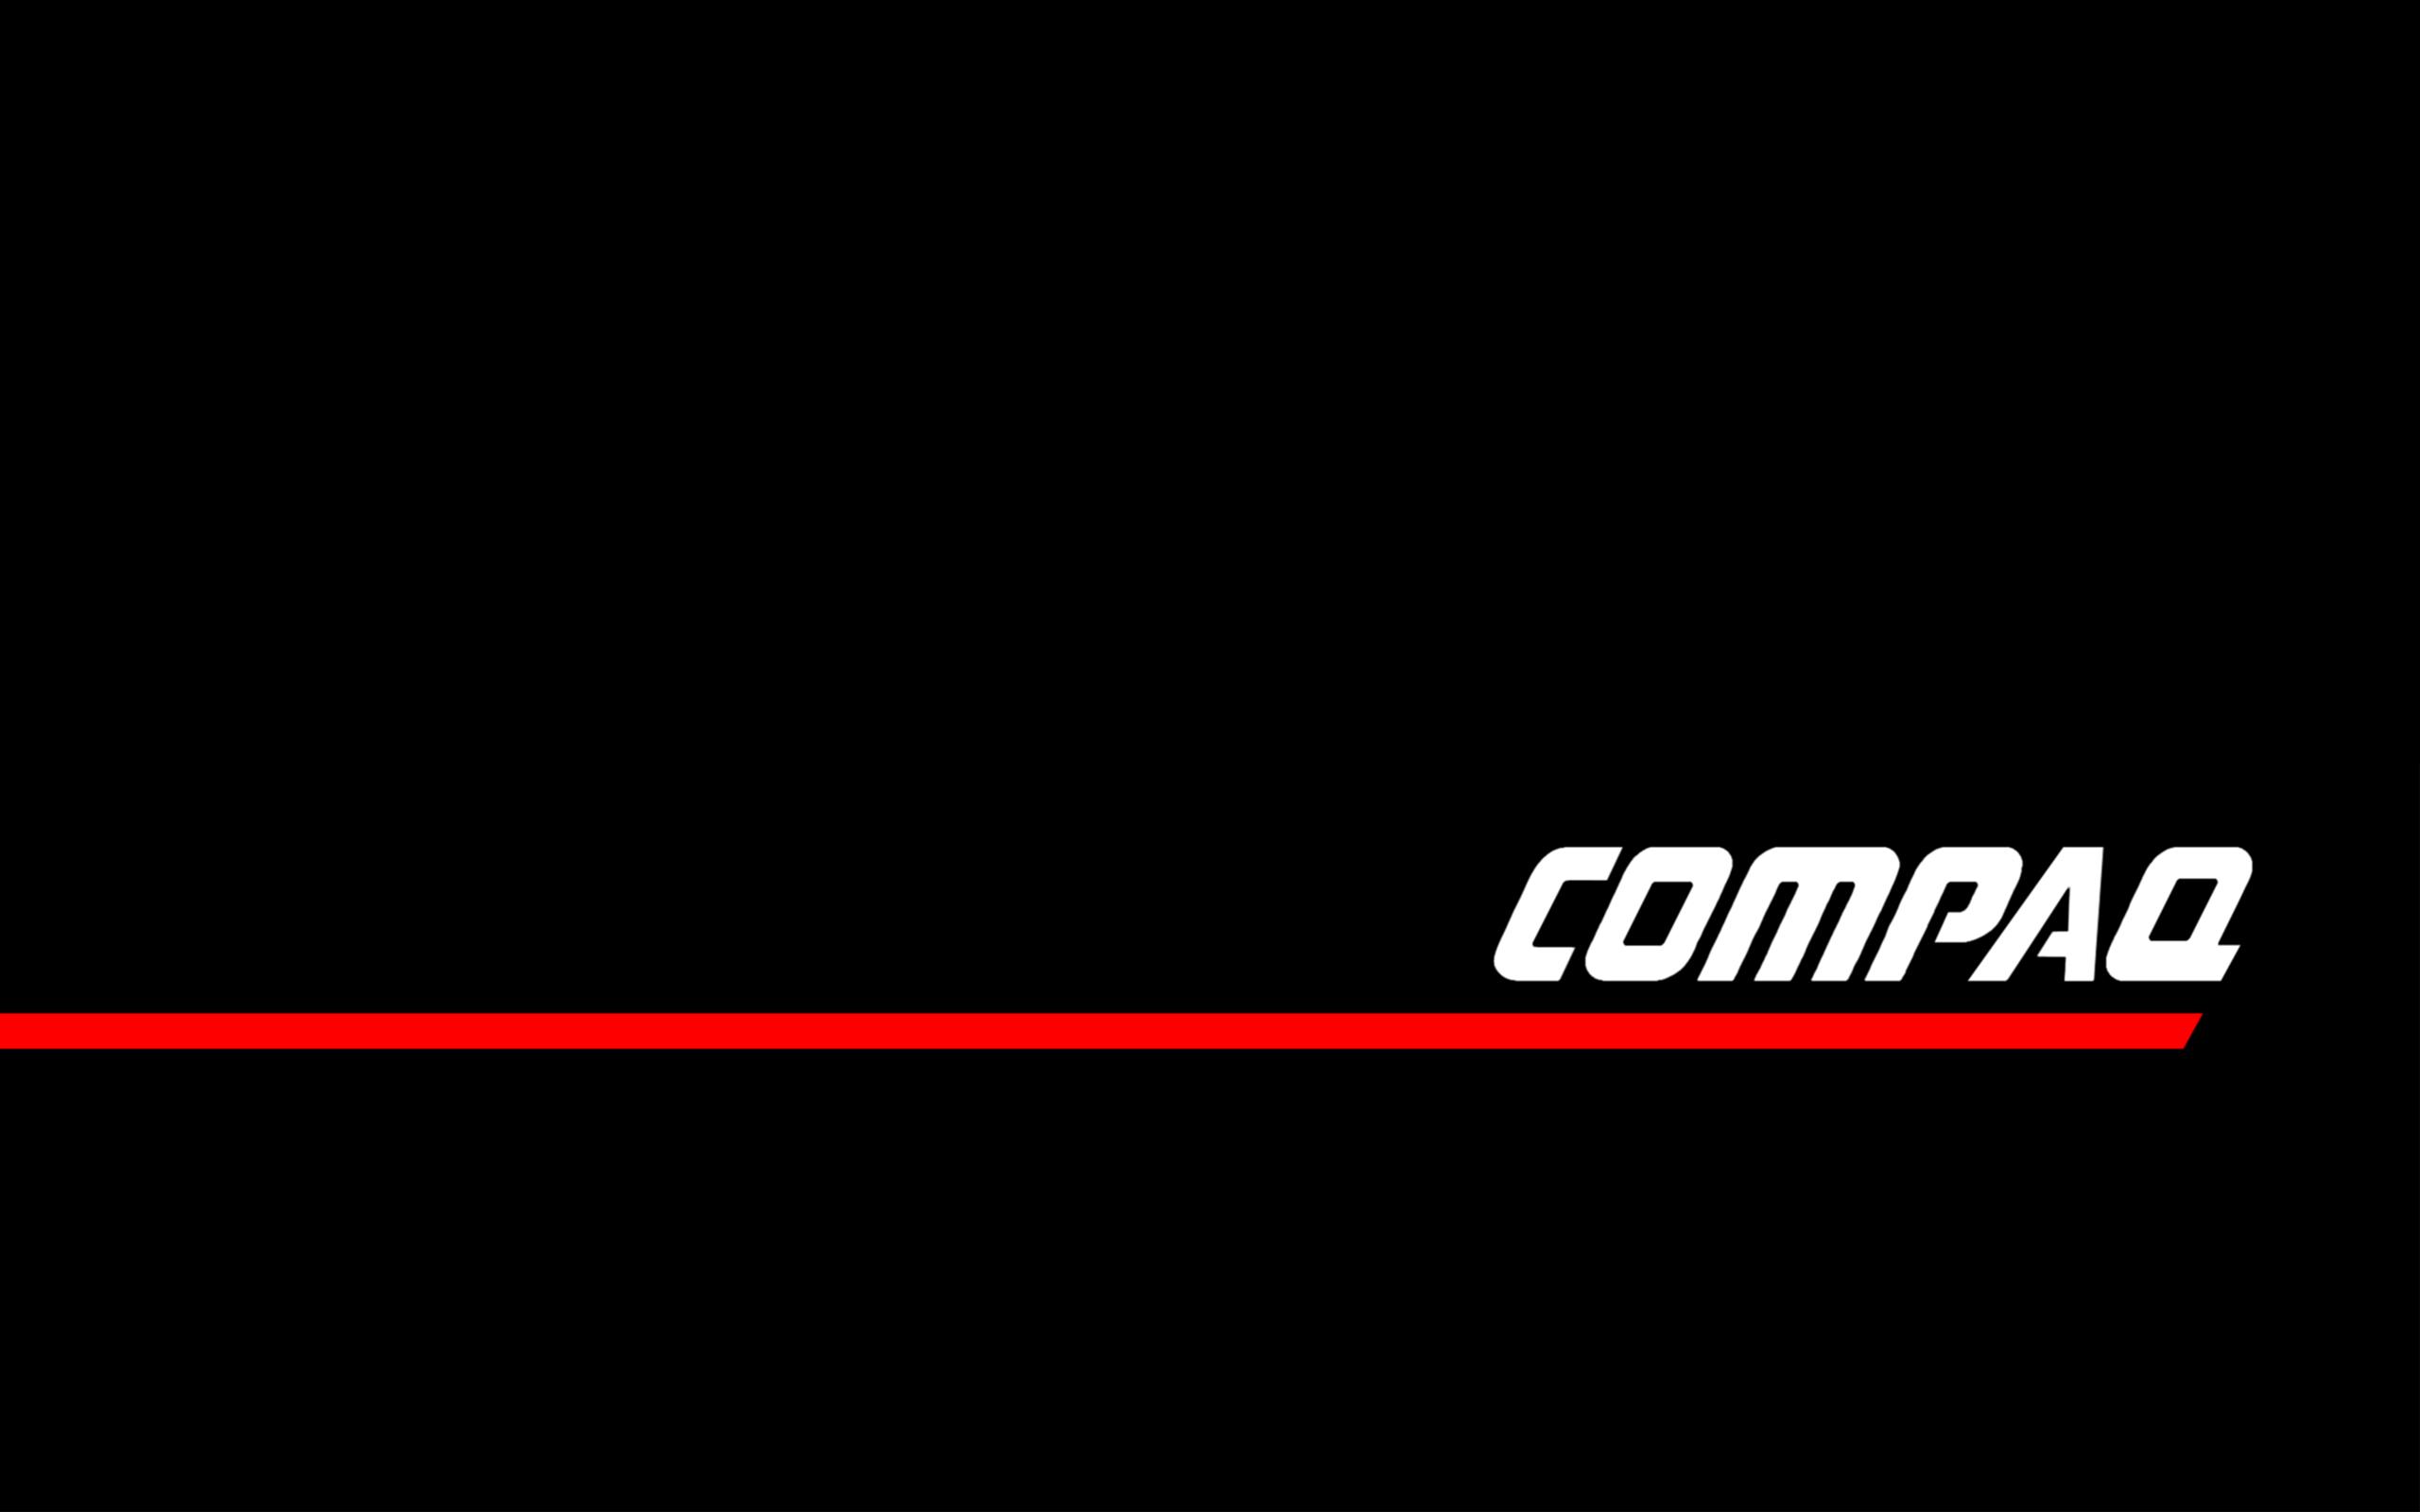 compaq HD Wallpaper   General 464596 2560x1600